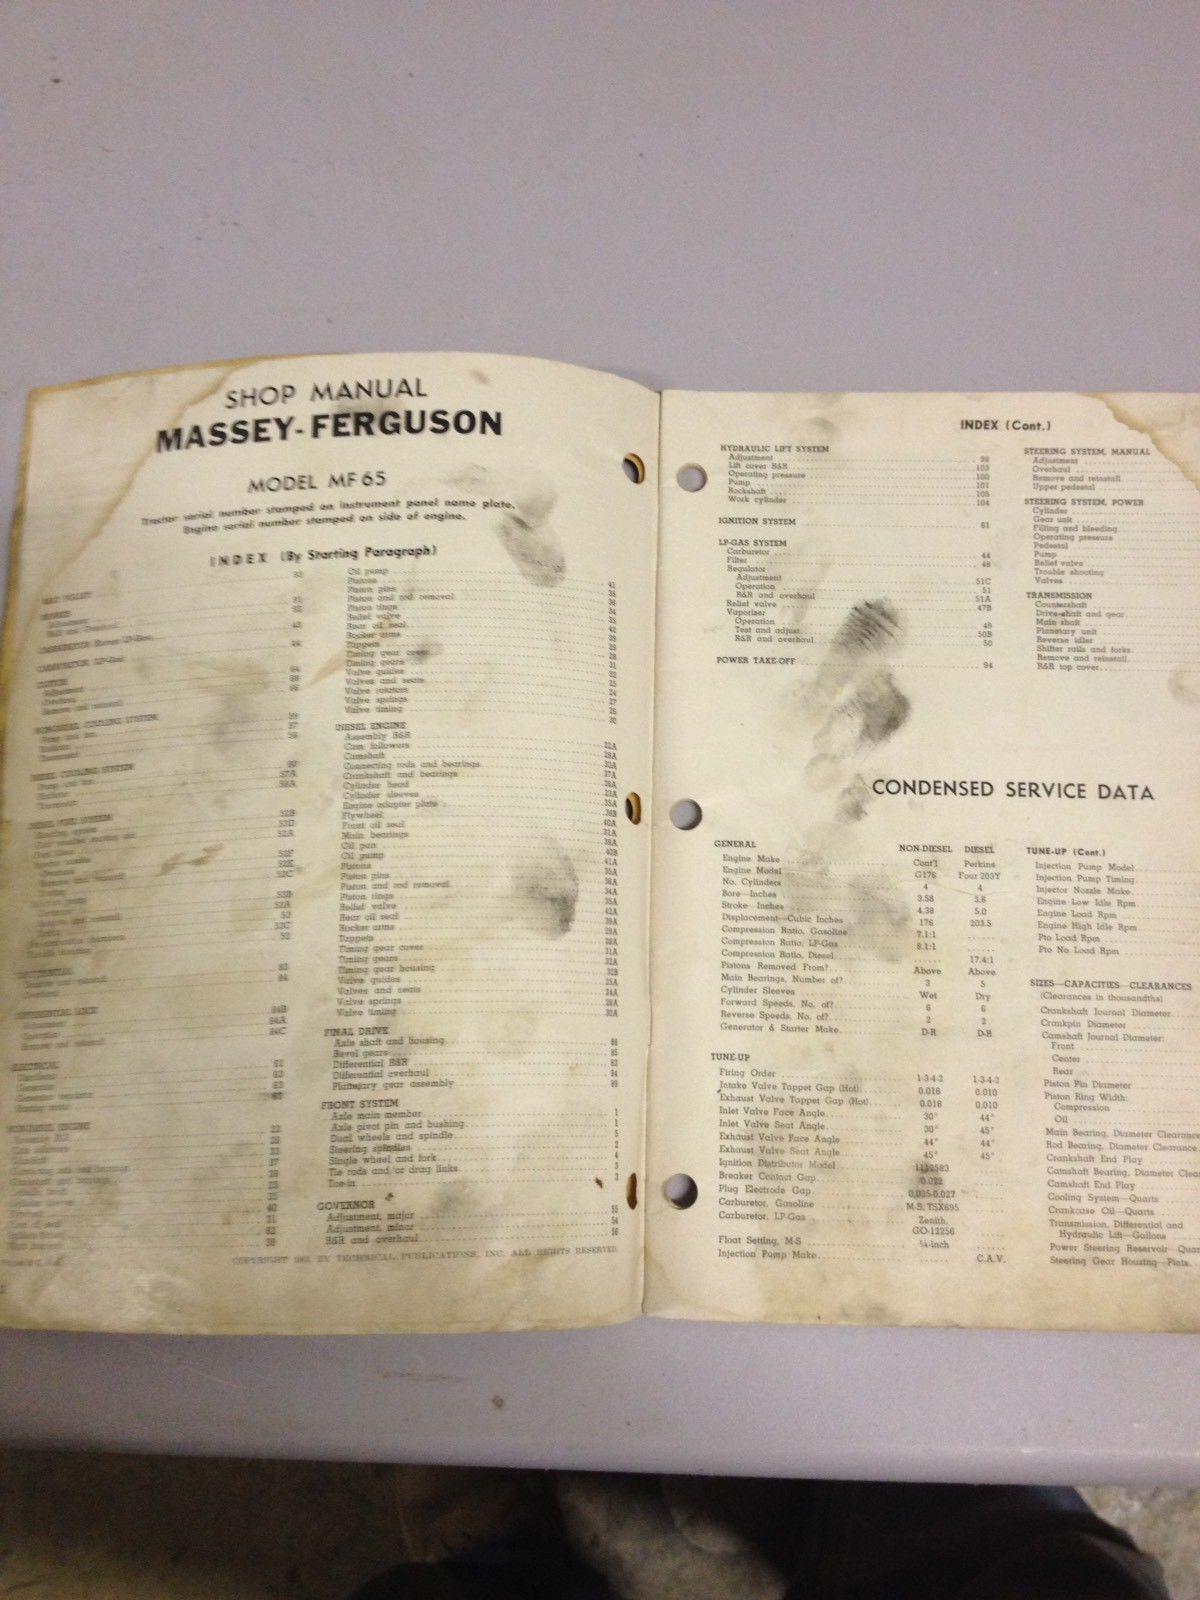 ... I & T Shop Service Manual MF-17 Massey Ferguson MF65 (ddf421)